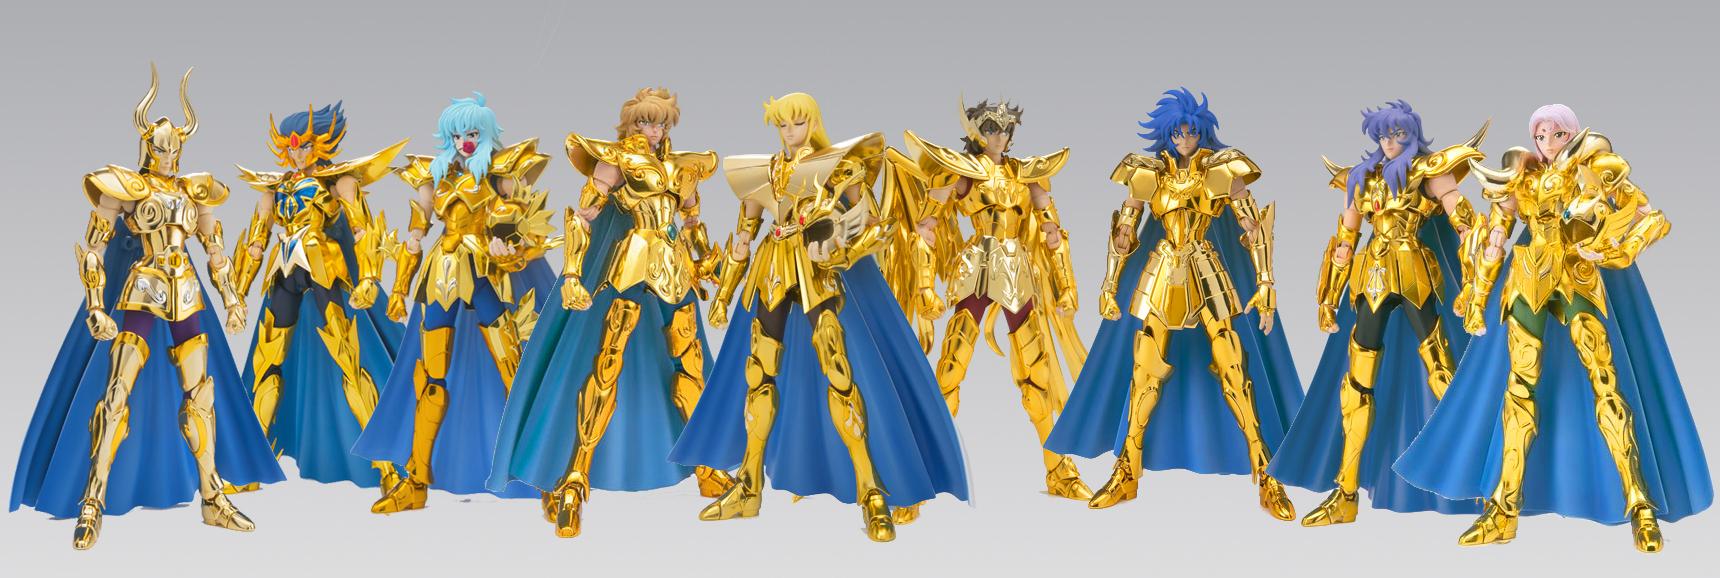 [Luglio 2013] Saint Cloth Myth EX Capricorn Shura - Pagina 2 50589610148344a5